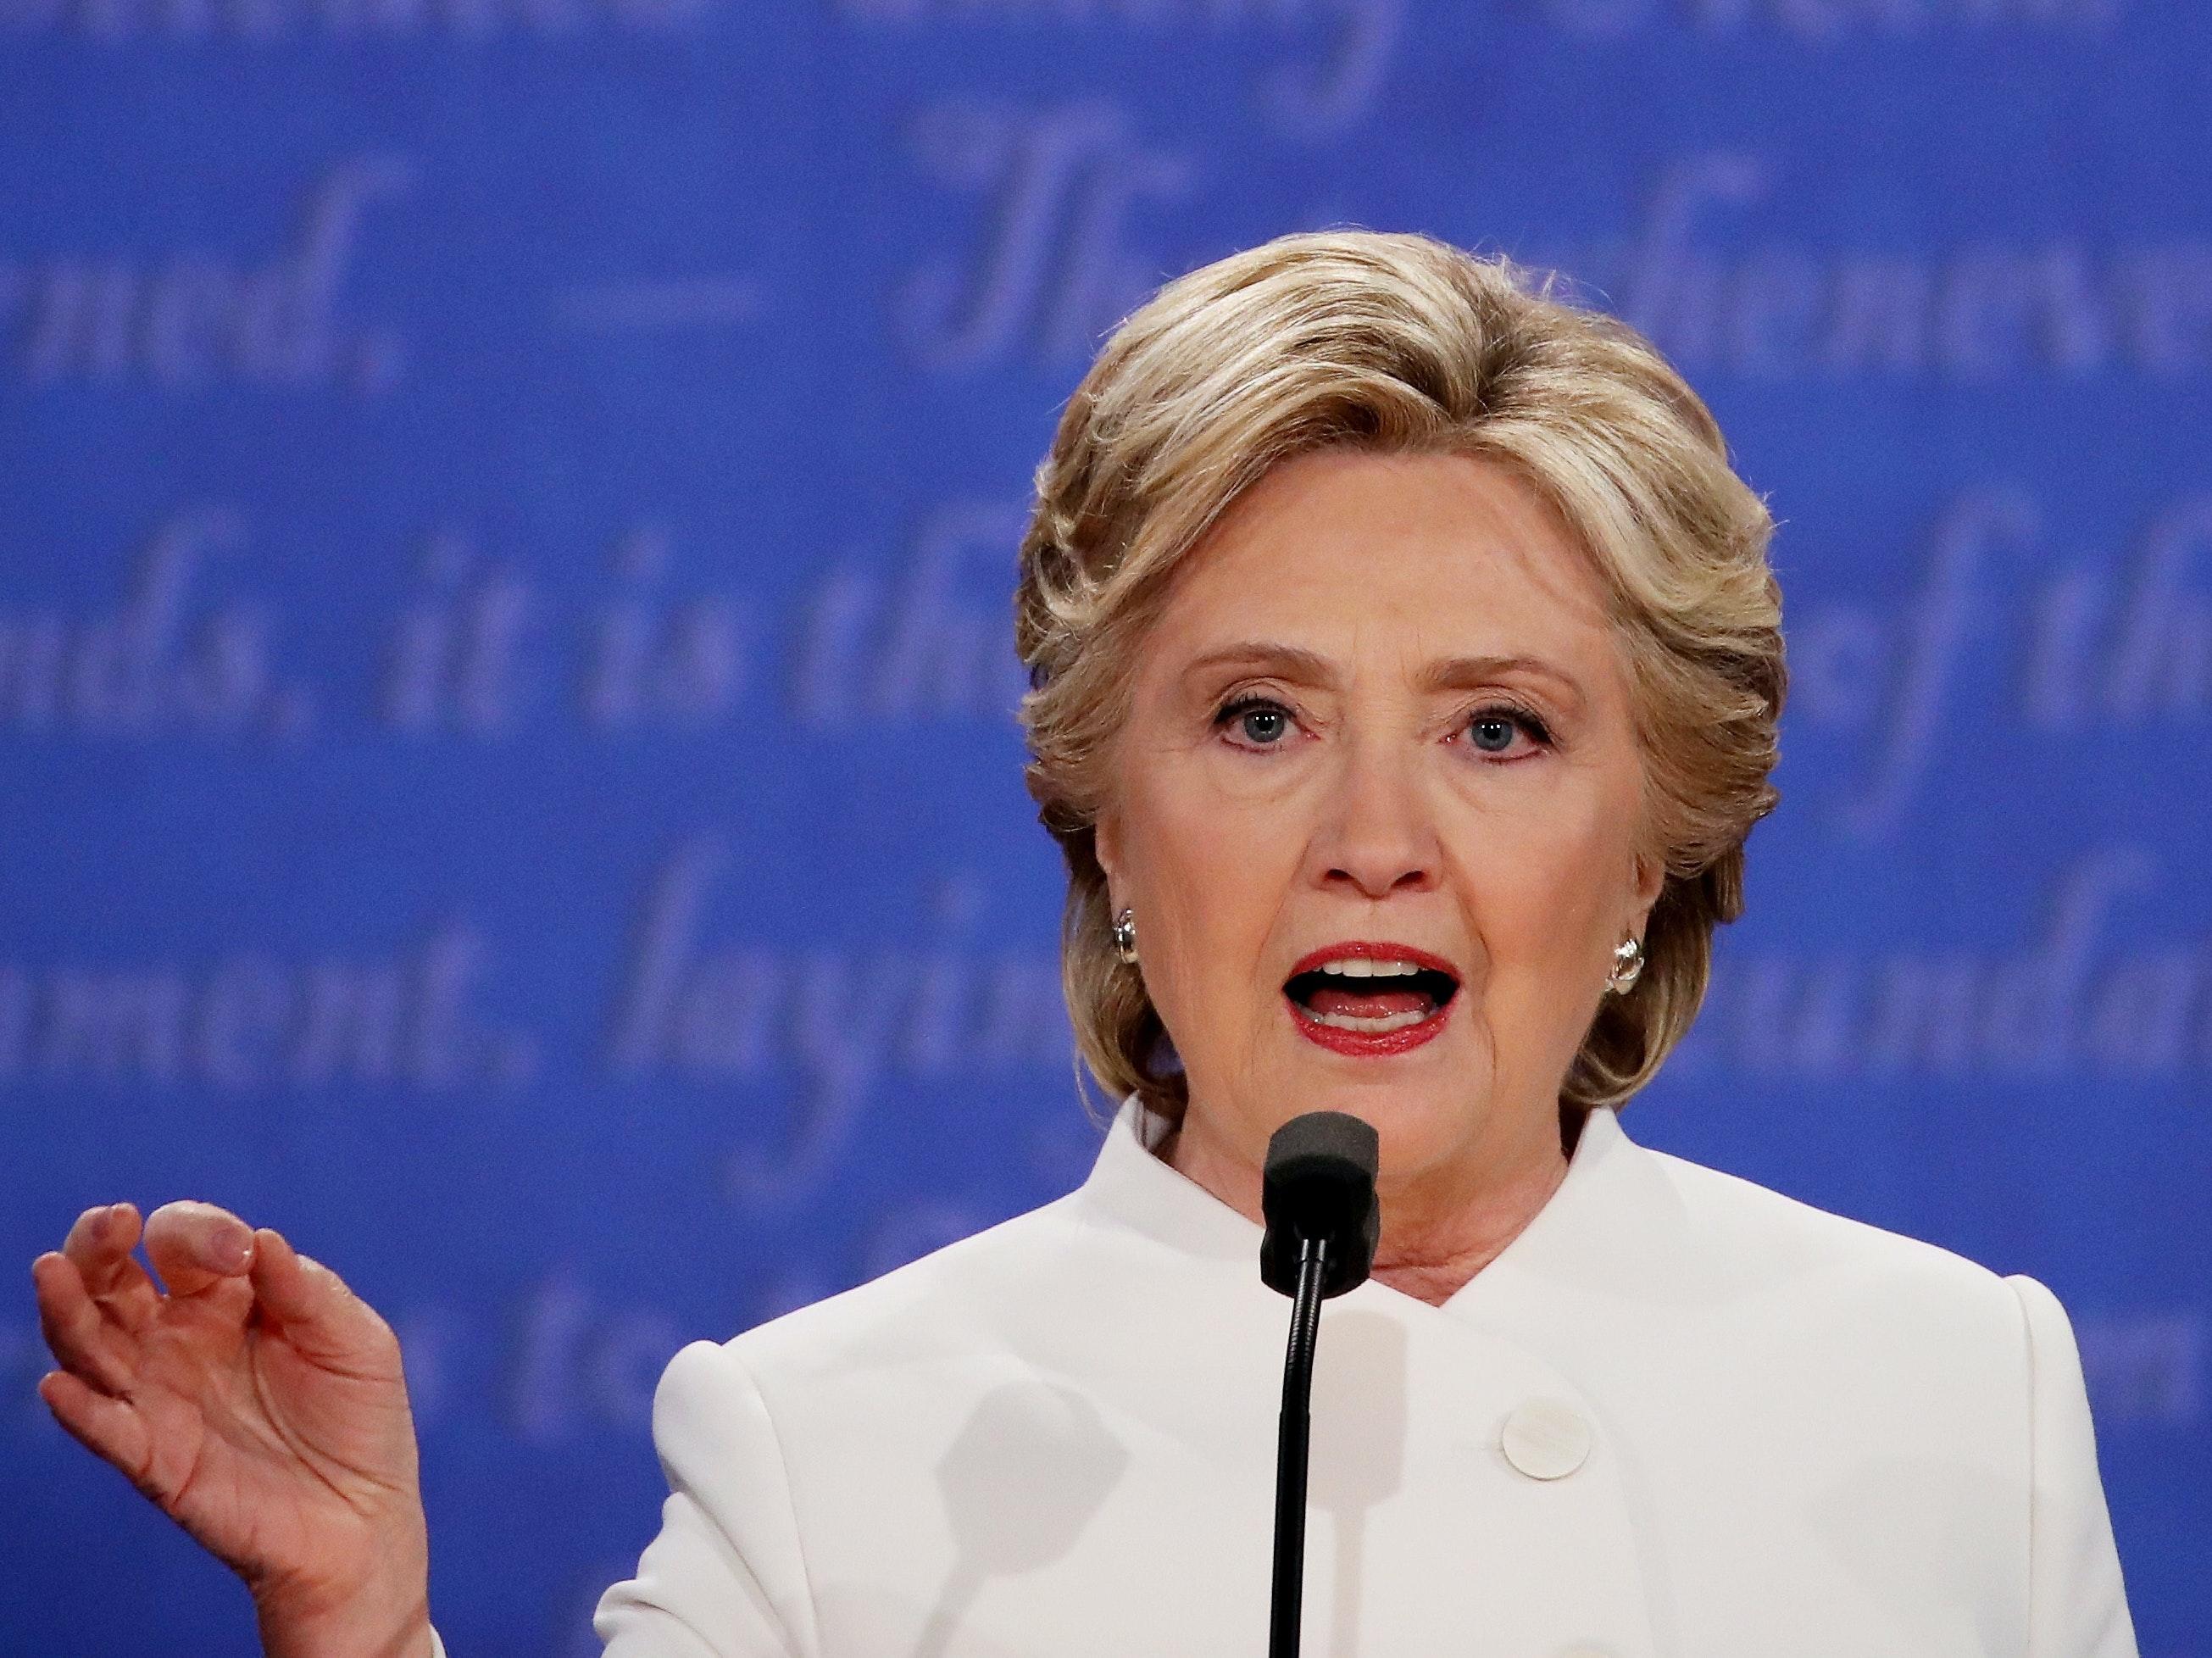 Hillary Clinton during the third presidential debate.